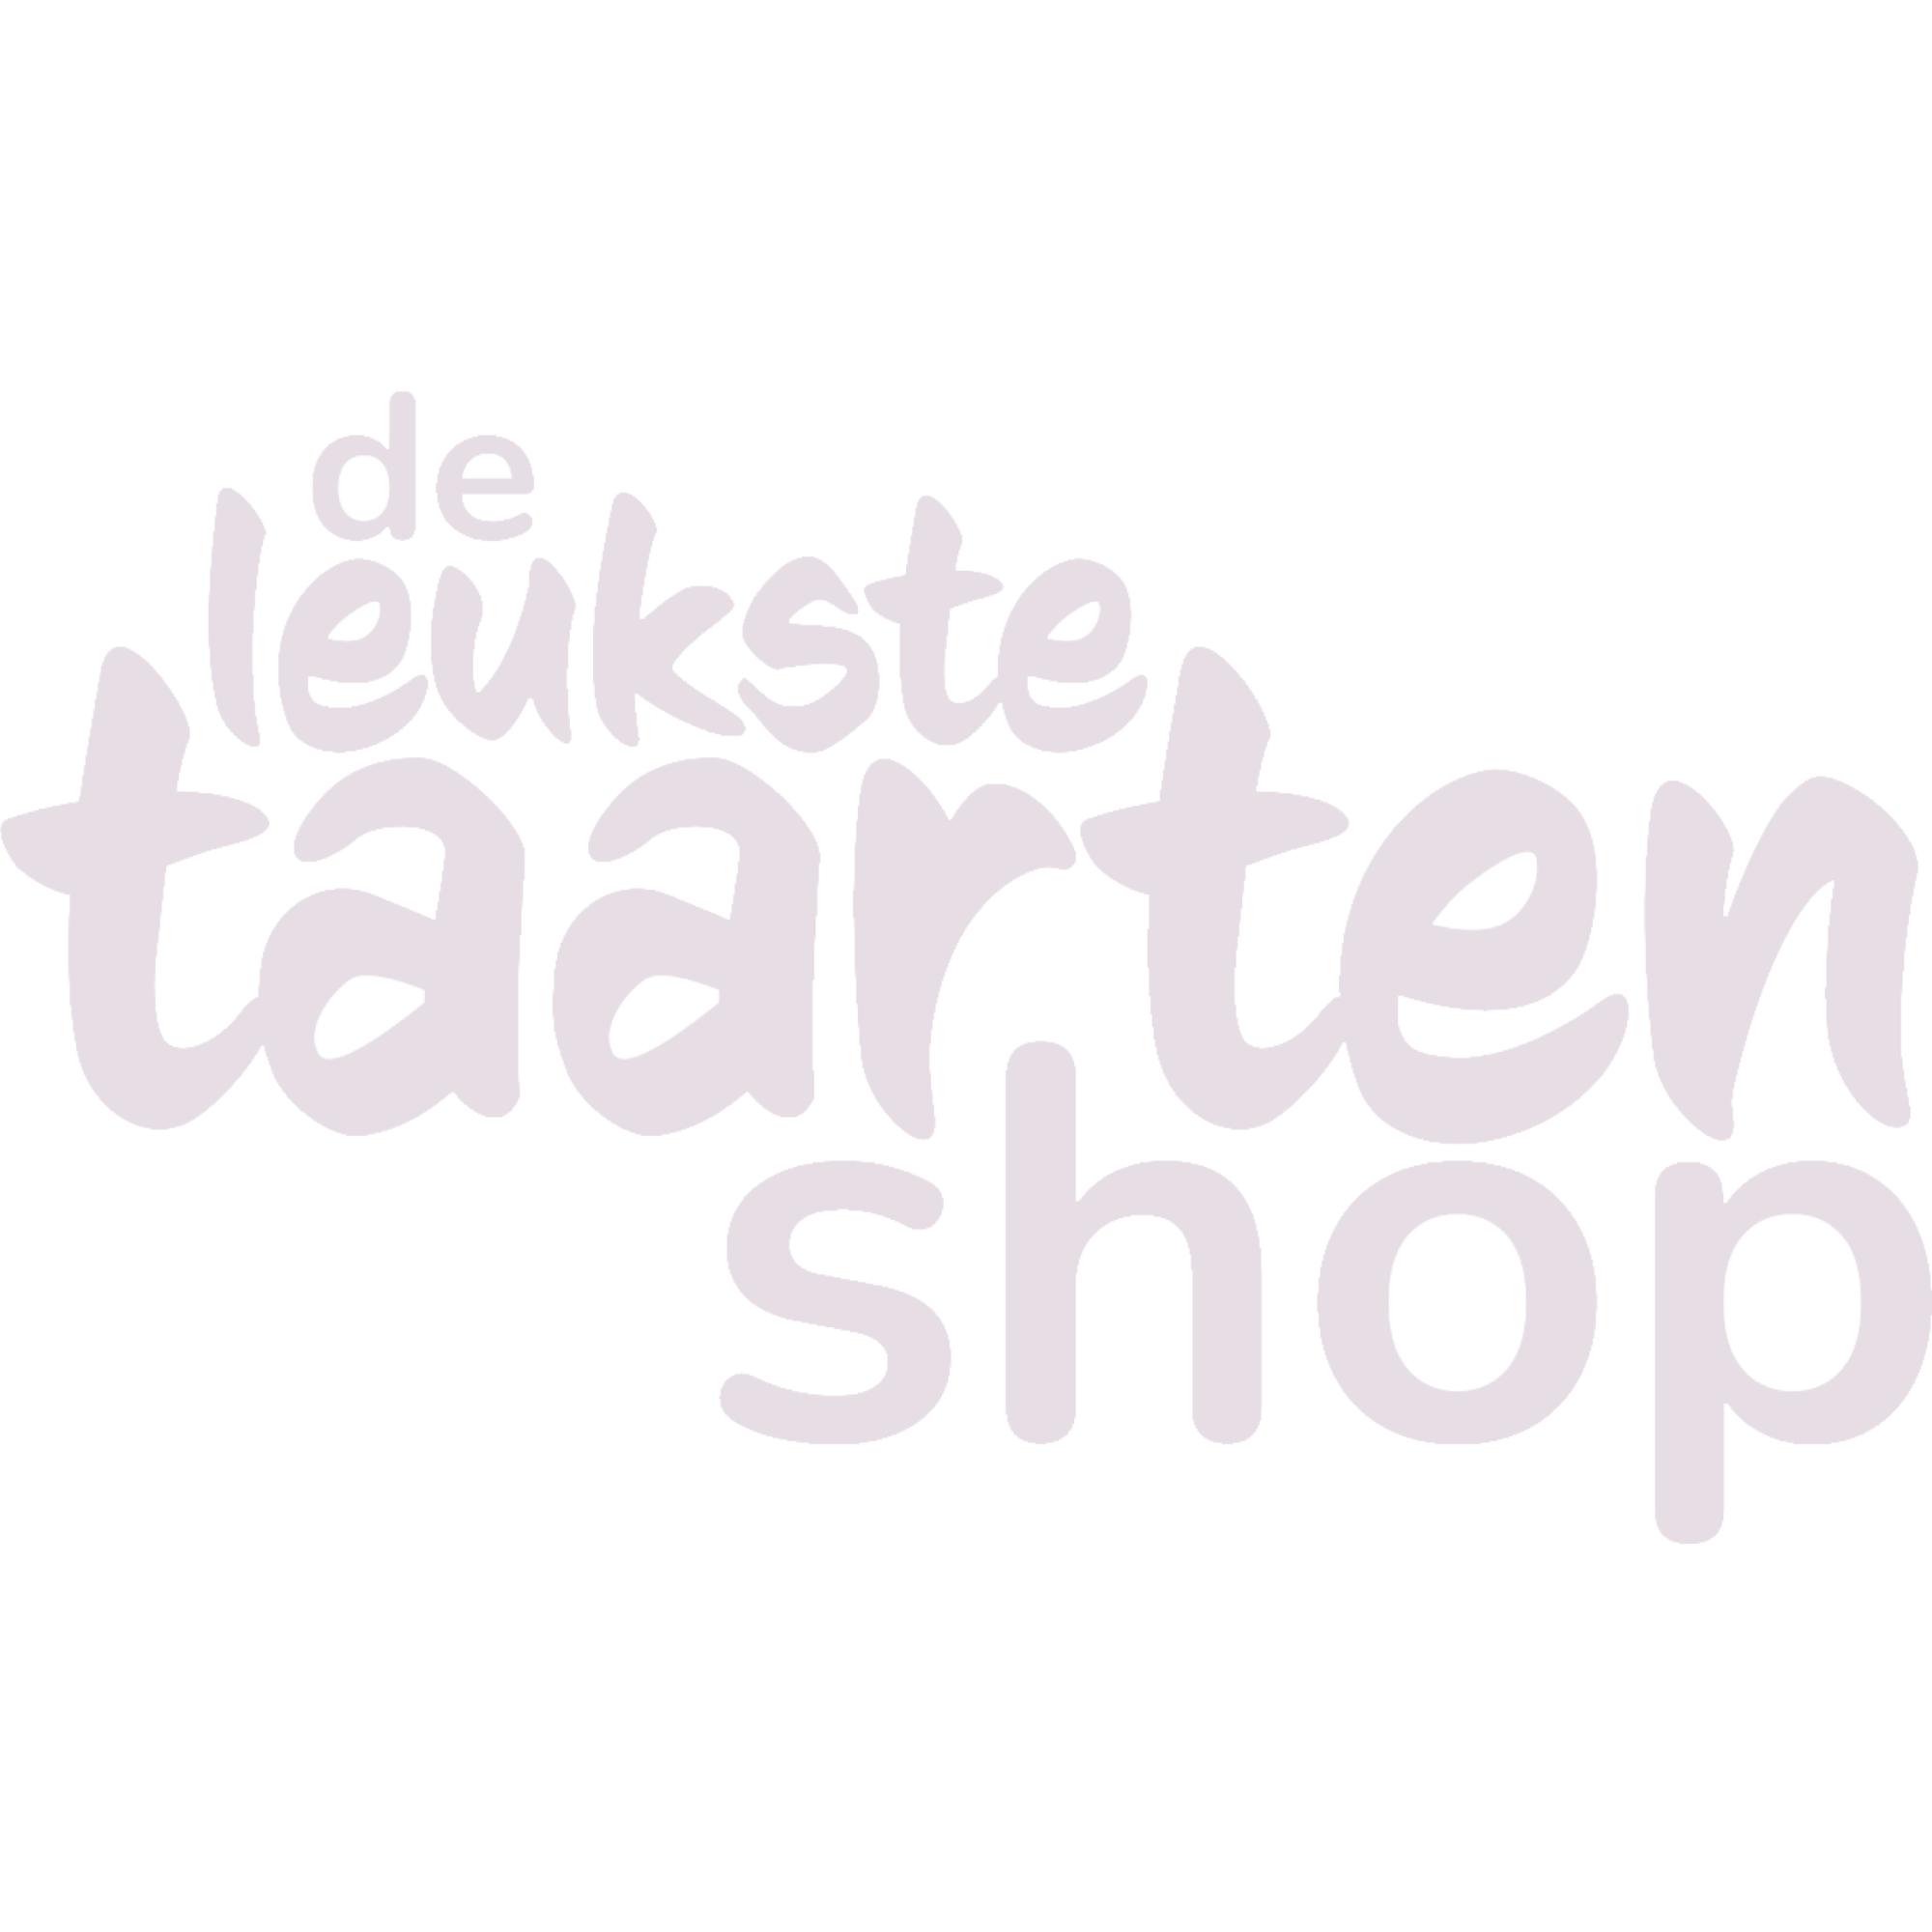 Recept  Cupcakes Baby Boy   Deleukstetaartenshop nl